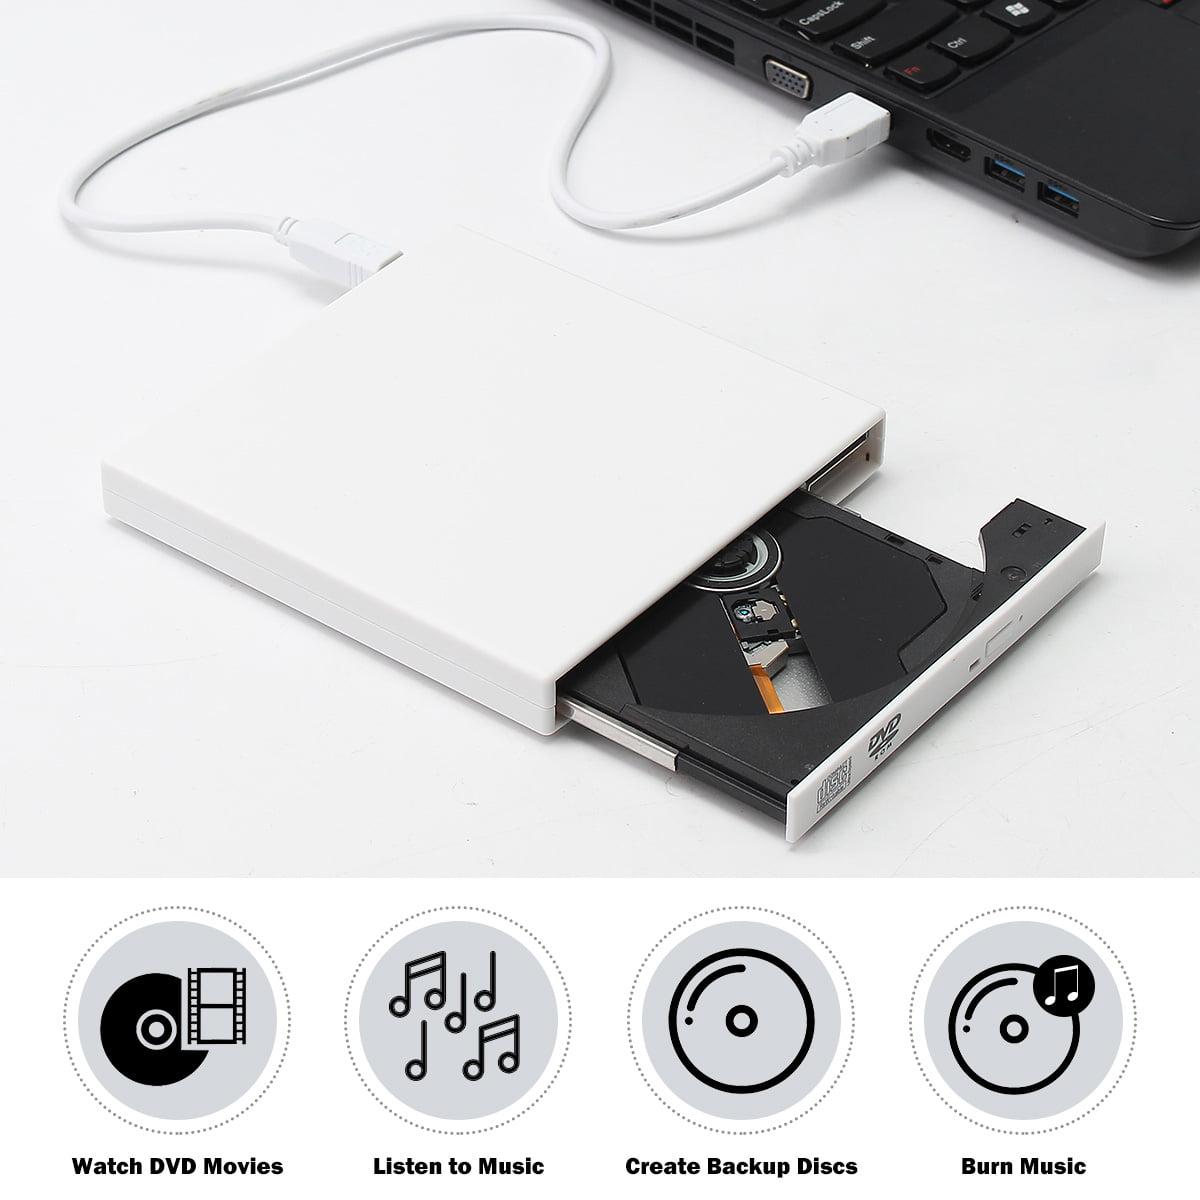 USB 2.0 External DVD Combo CD-RW Burner Drive CD±RW DVD ROM for PC Laptop